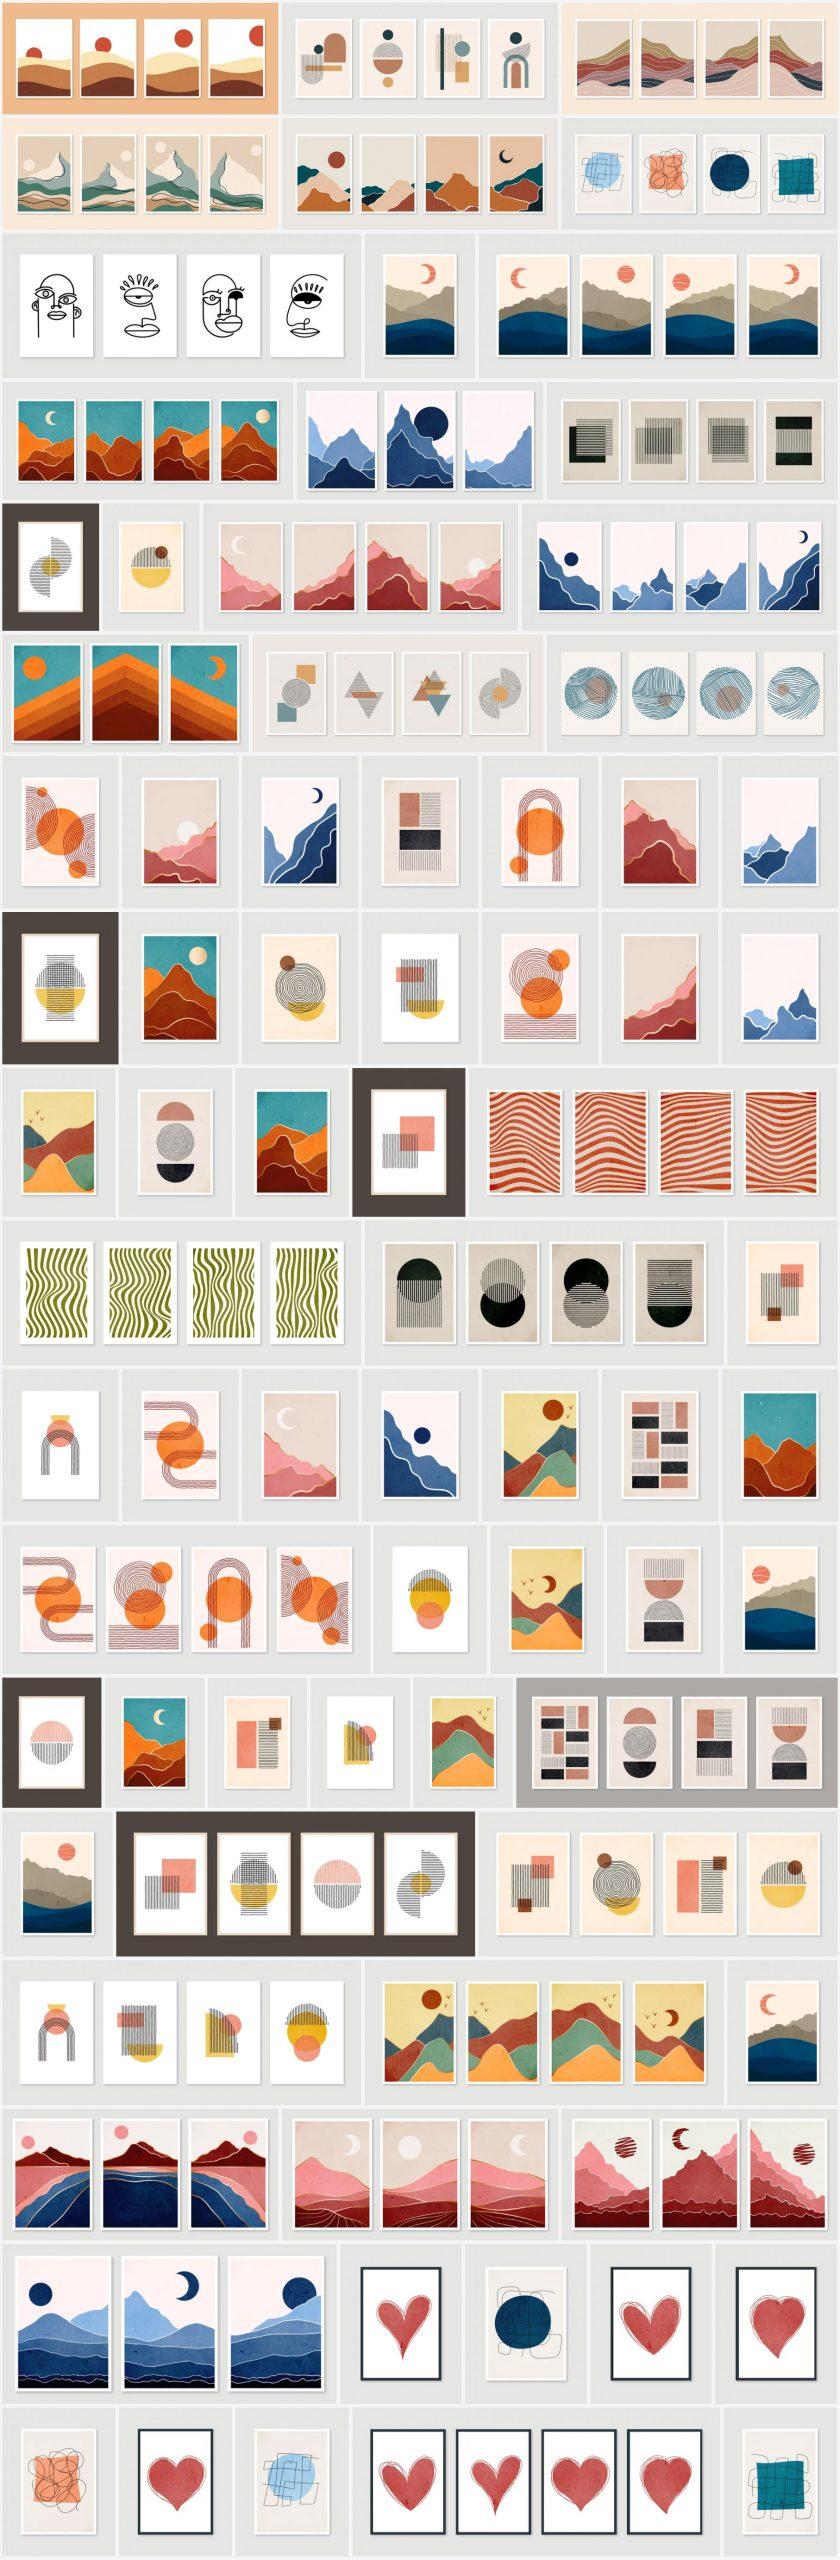 Vector graphics of minimalist graphic art prints.